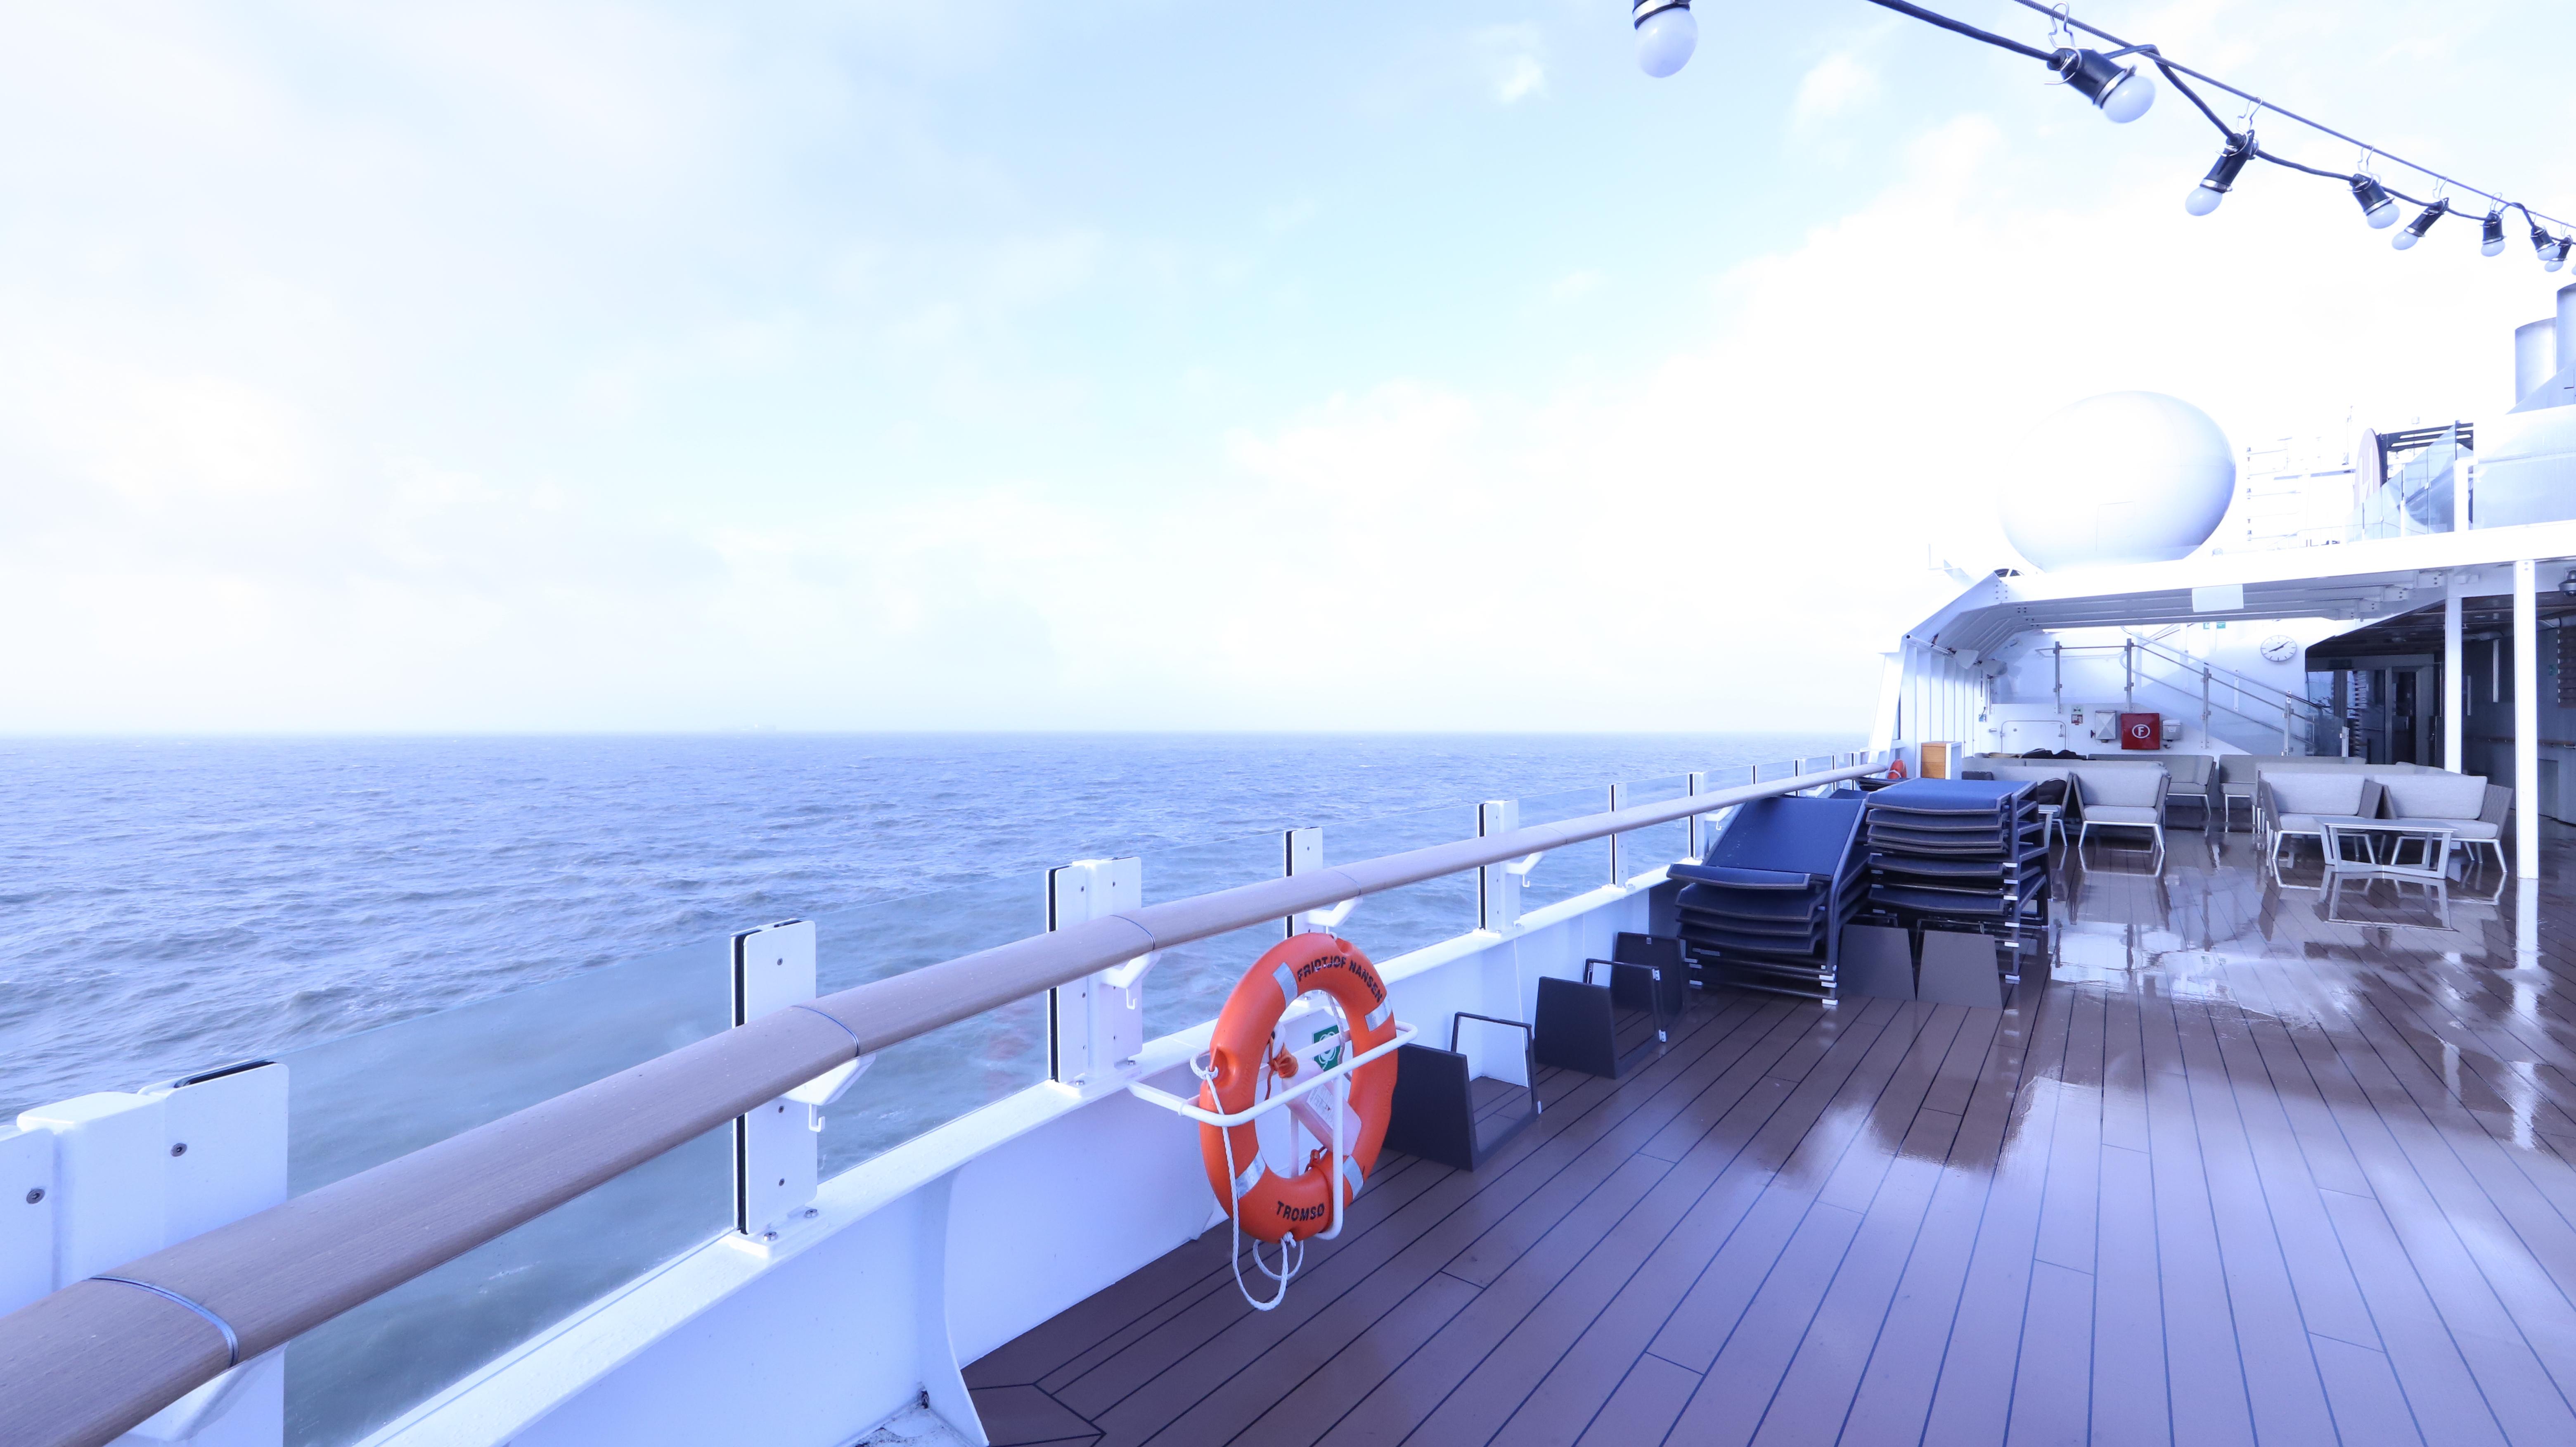 MS Fridtjof Nansen; On Deck